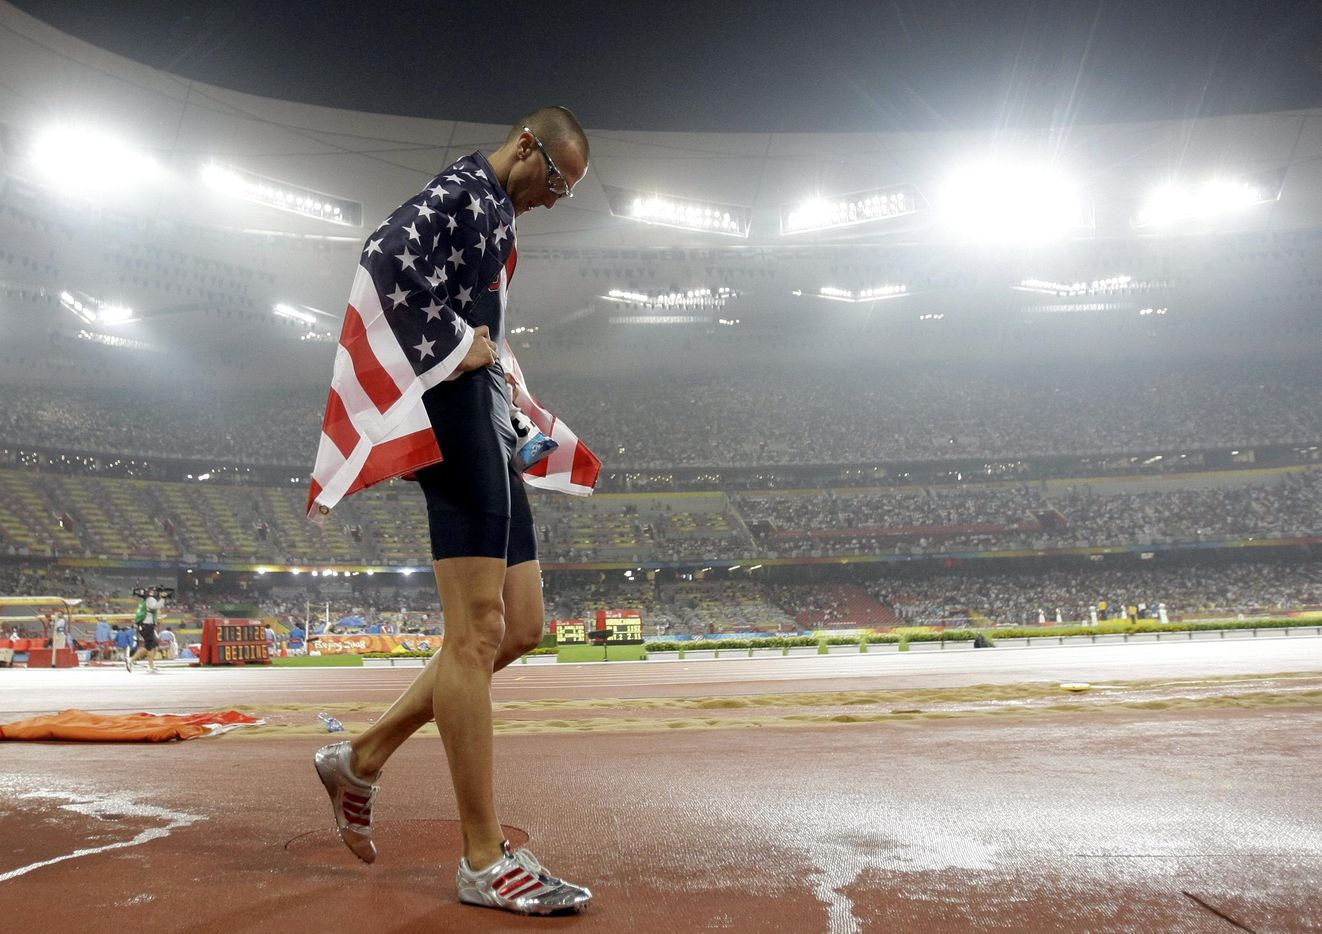 2008 Beijing Olympics: Silver medalist Jeremy Wariner walks around the National Stadium after LaShawn Merritt won gold in the Men's 400 meter final at the National Stadium  in Beijing, China Thursday August 21, 2008.